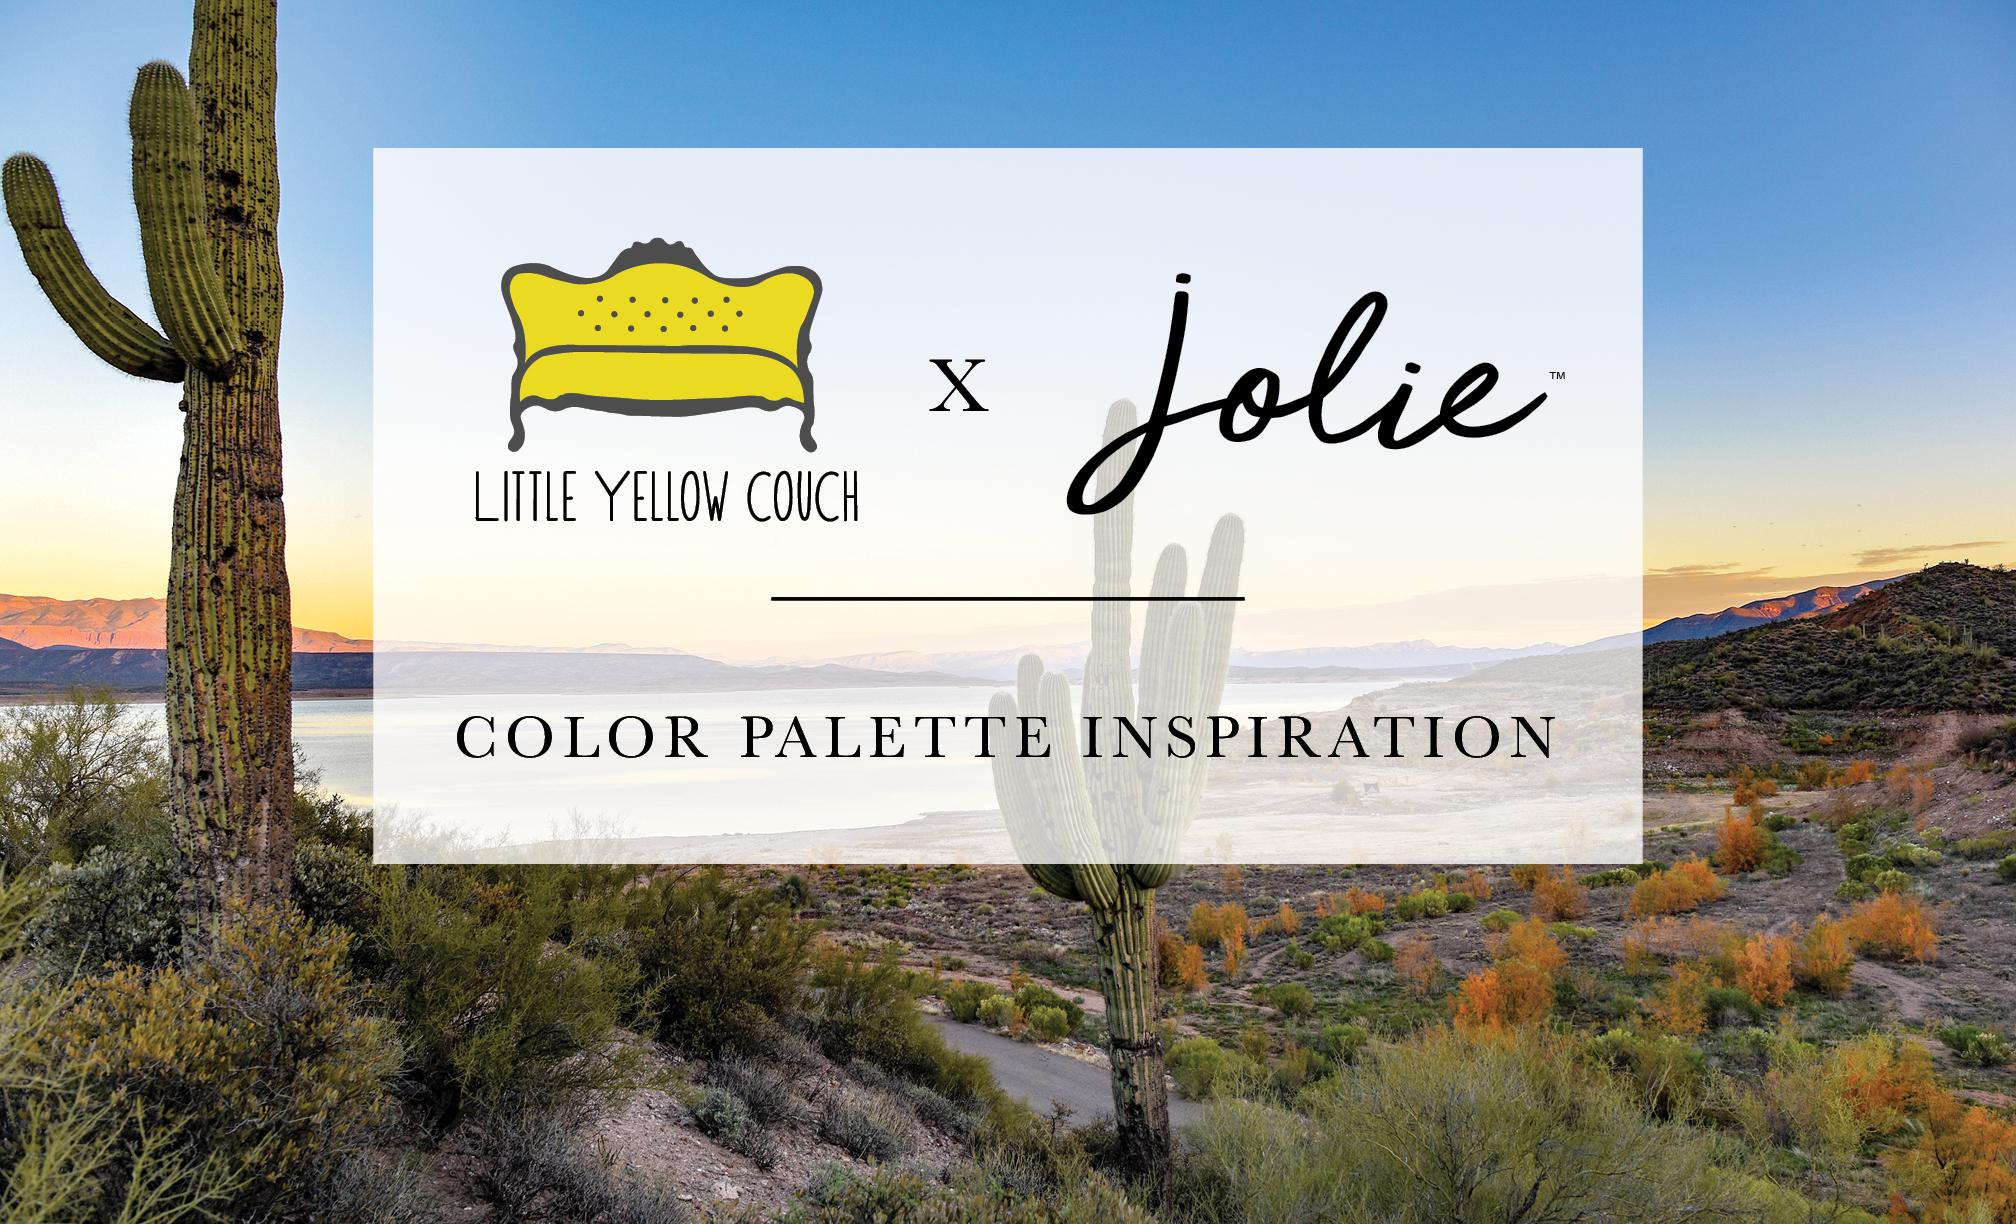 DesignInspo_LittleYellowCouchxJolie_cover.jpg